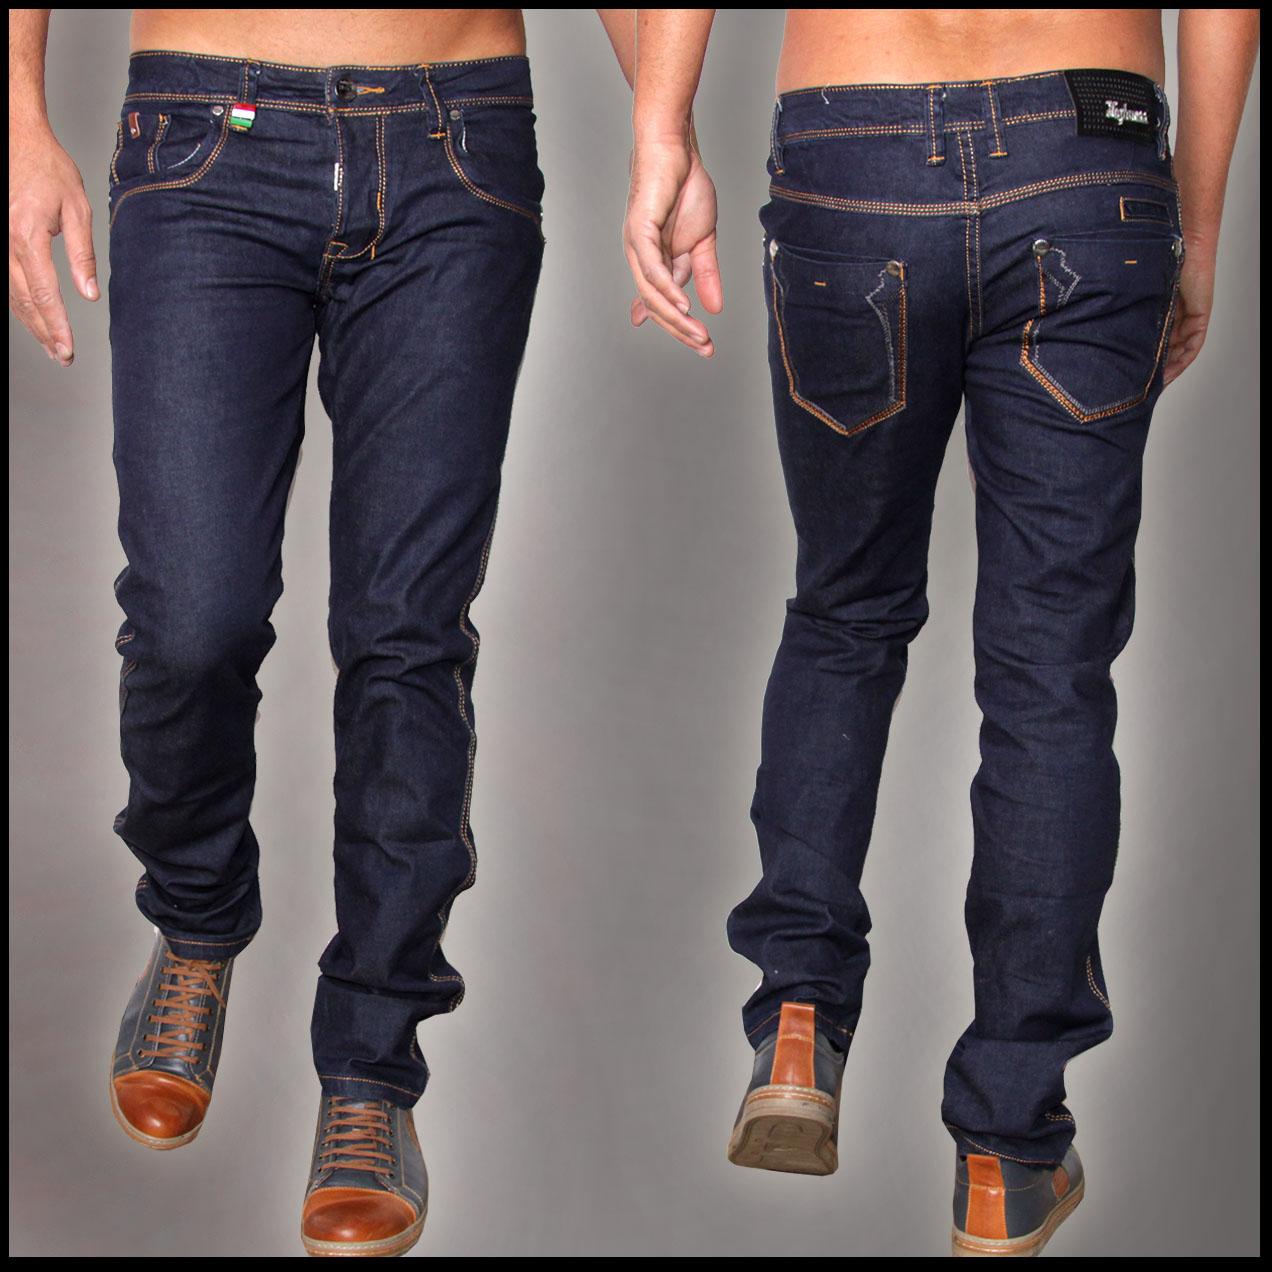 tazzio slim fit herren styler look stretch jeans hose denim 16533 blau 33 32. Black Bedroom Furniture Sets. Home Design Ideas